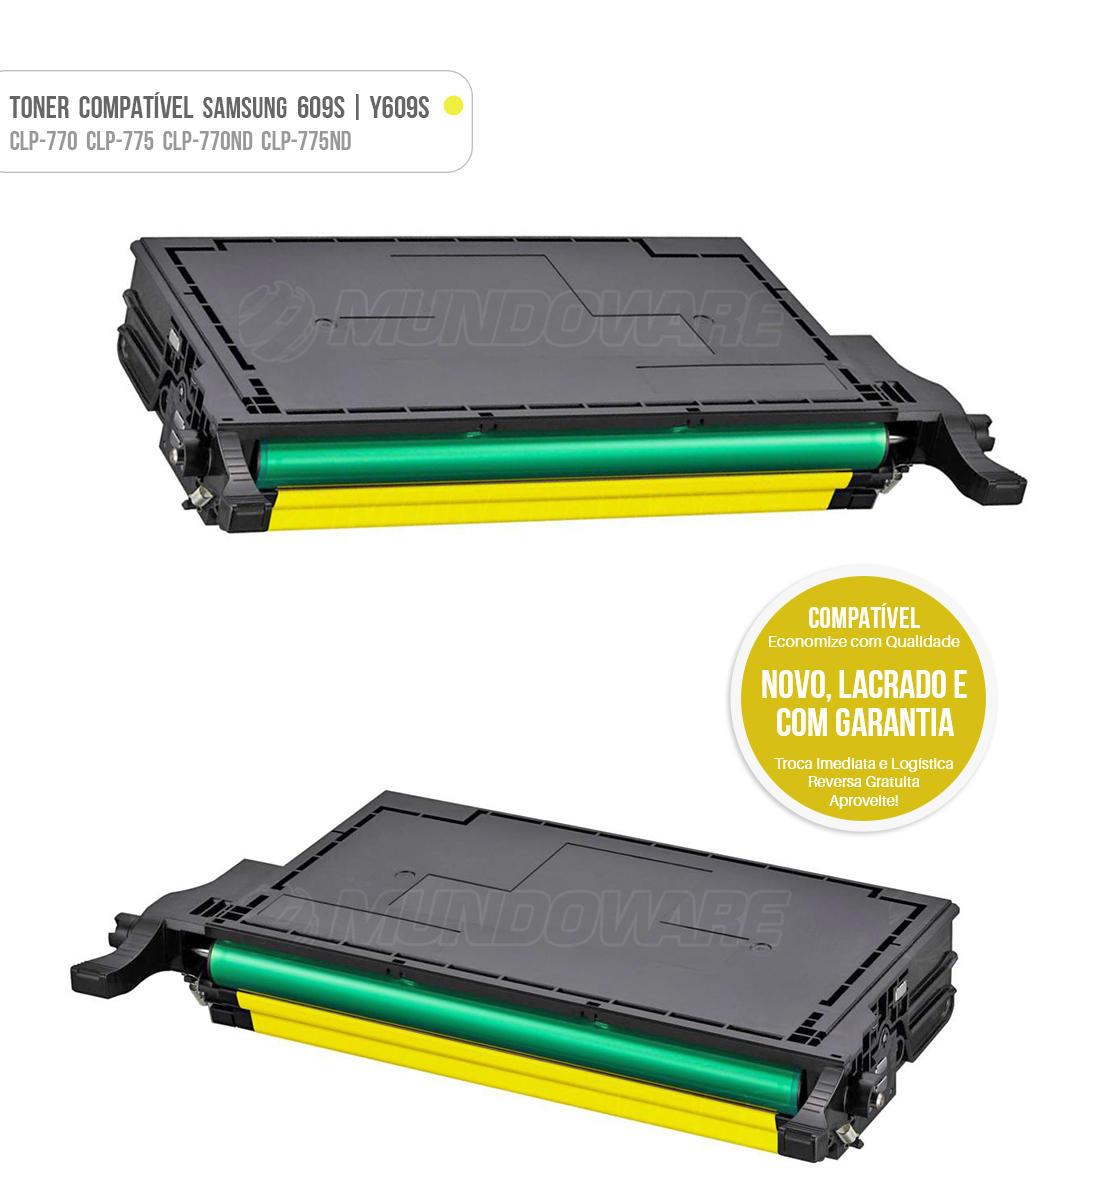 Toner Amarelo Compatível com CLT609 Y609S 609S para impressora Samsung CLP-770 CLP-775 CLP-770ND CLP-775ND CLP770 CLP775 CLP770ND CLP775ND Tonner